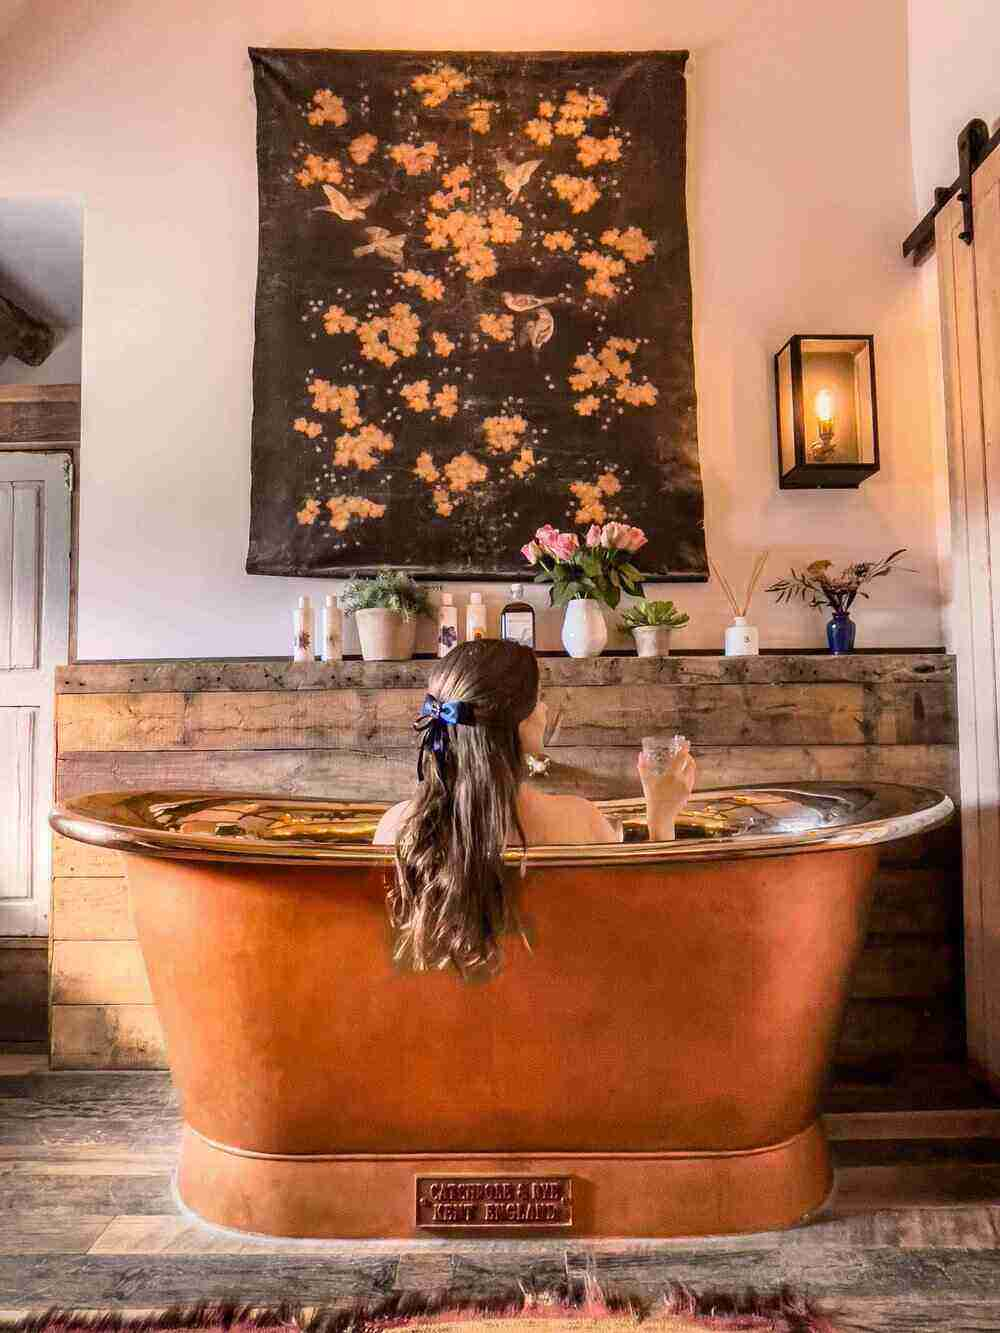 Aritst Residence Oxfordshire Bathtub